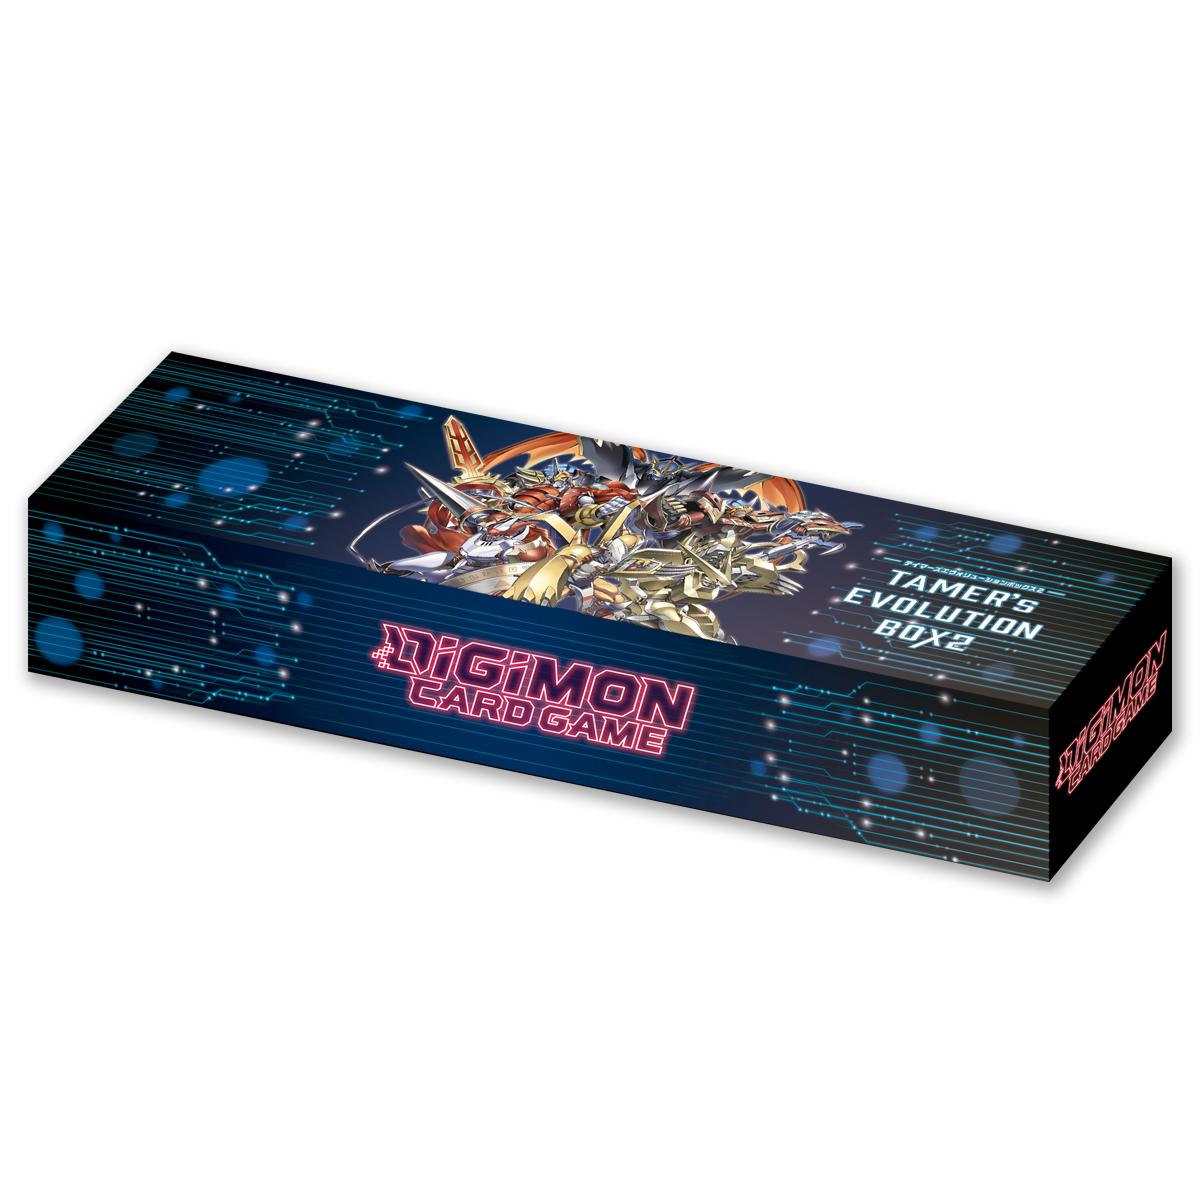 cardgamevolutionboxus7_january17_2021.jpg